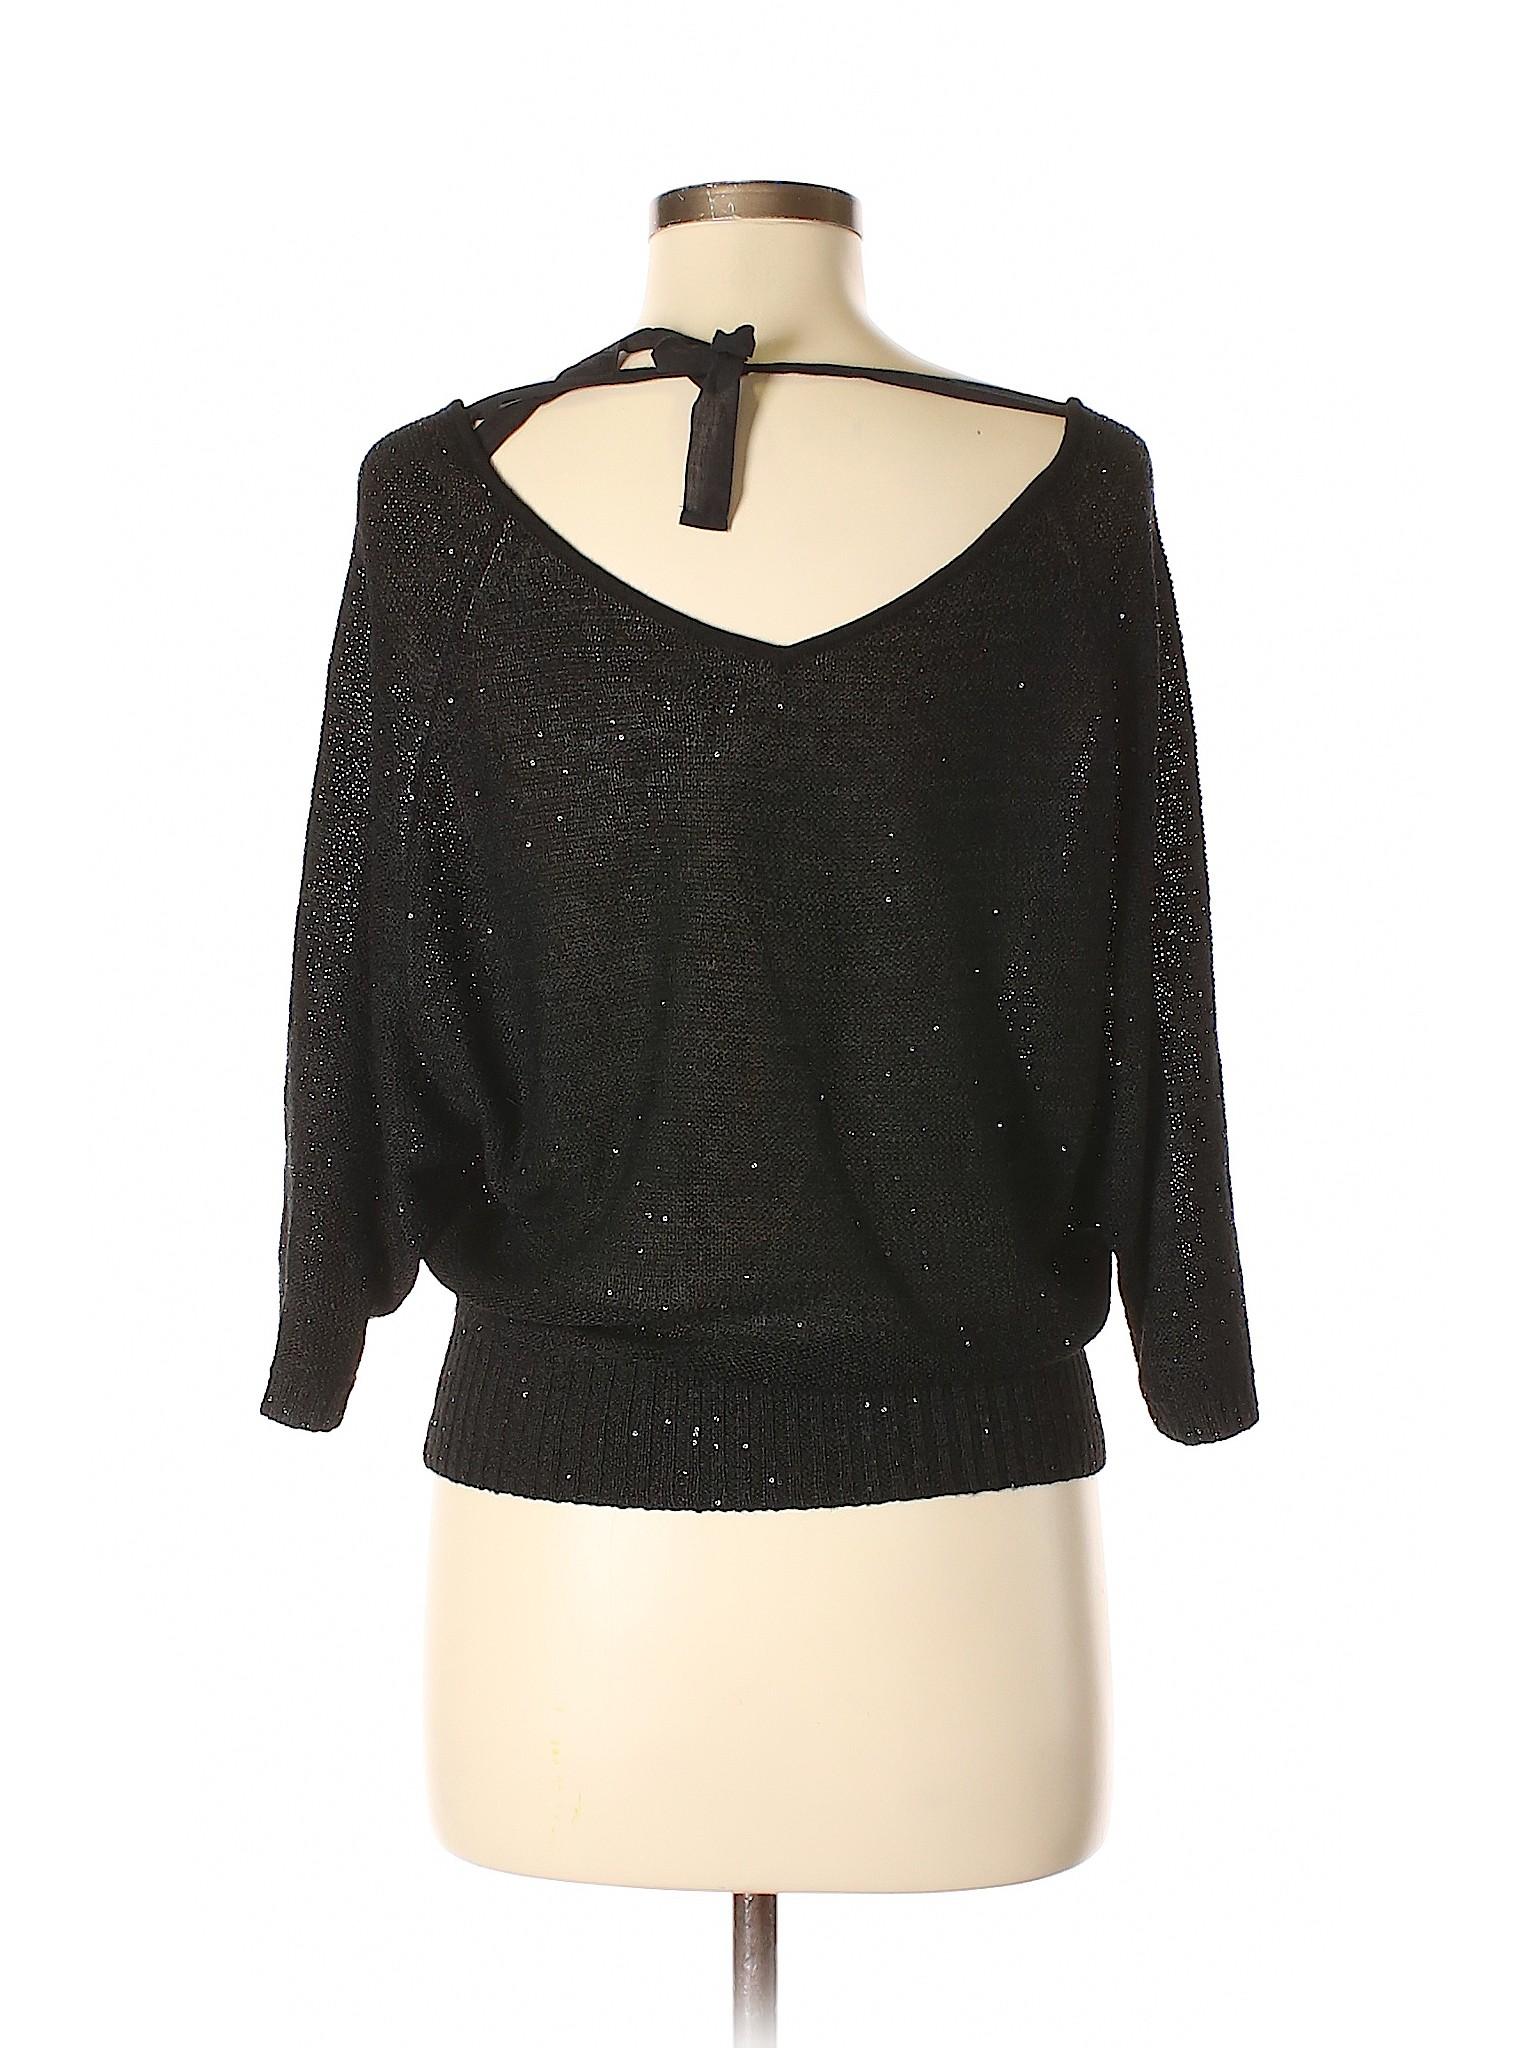 LOFT Sweater Ann Boutique Pullover Taylor EBOnqq6